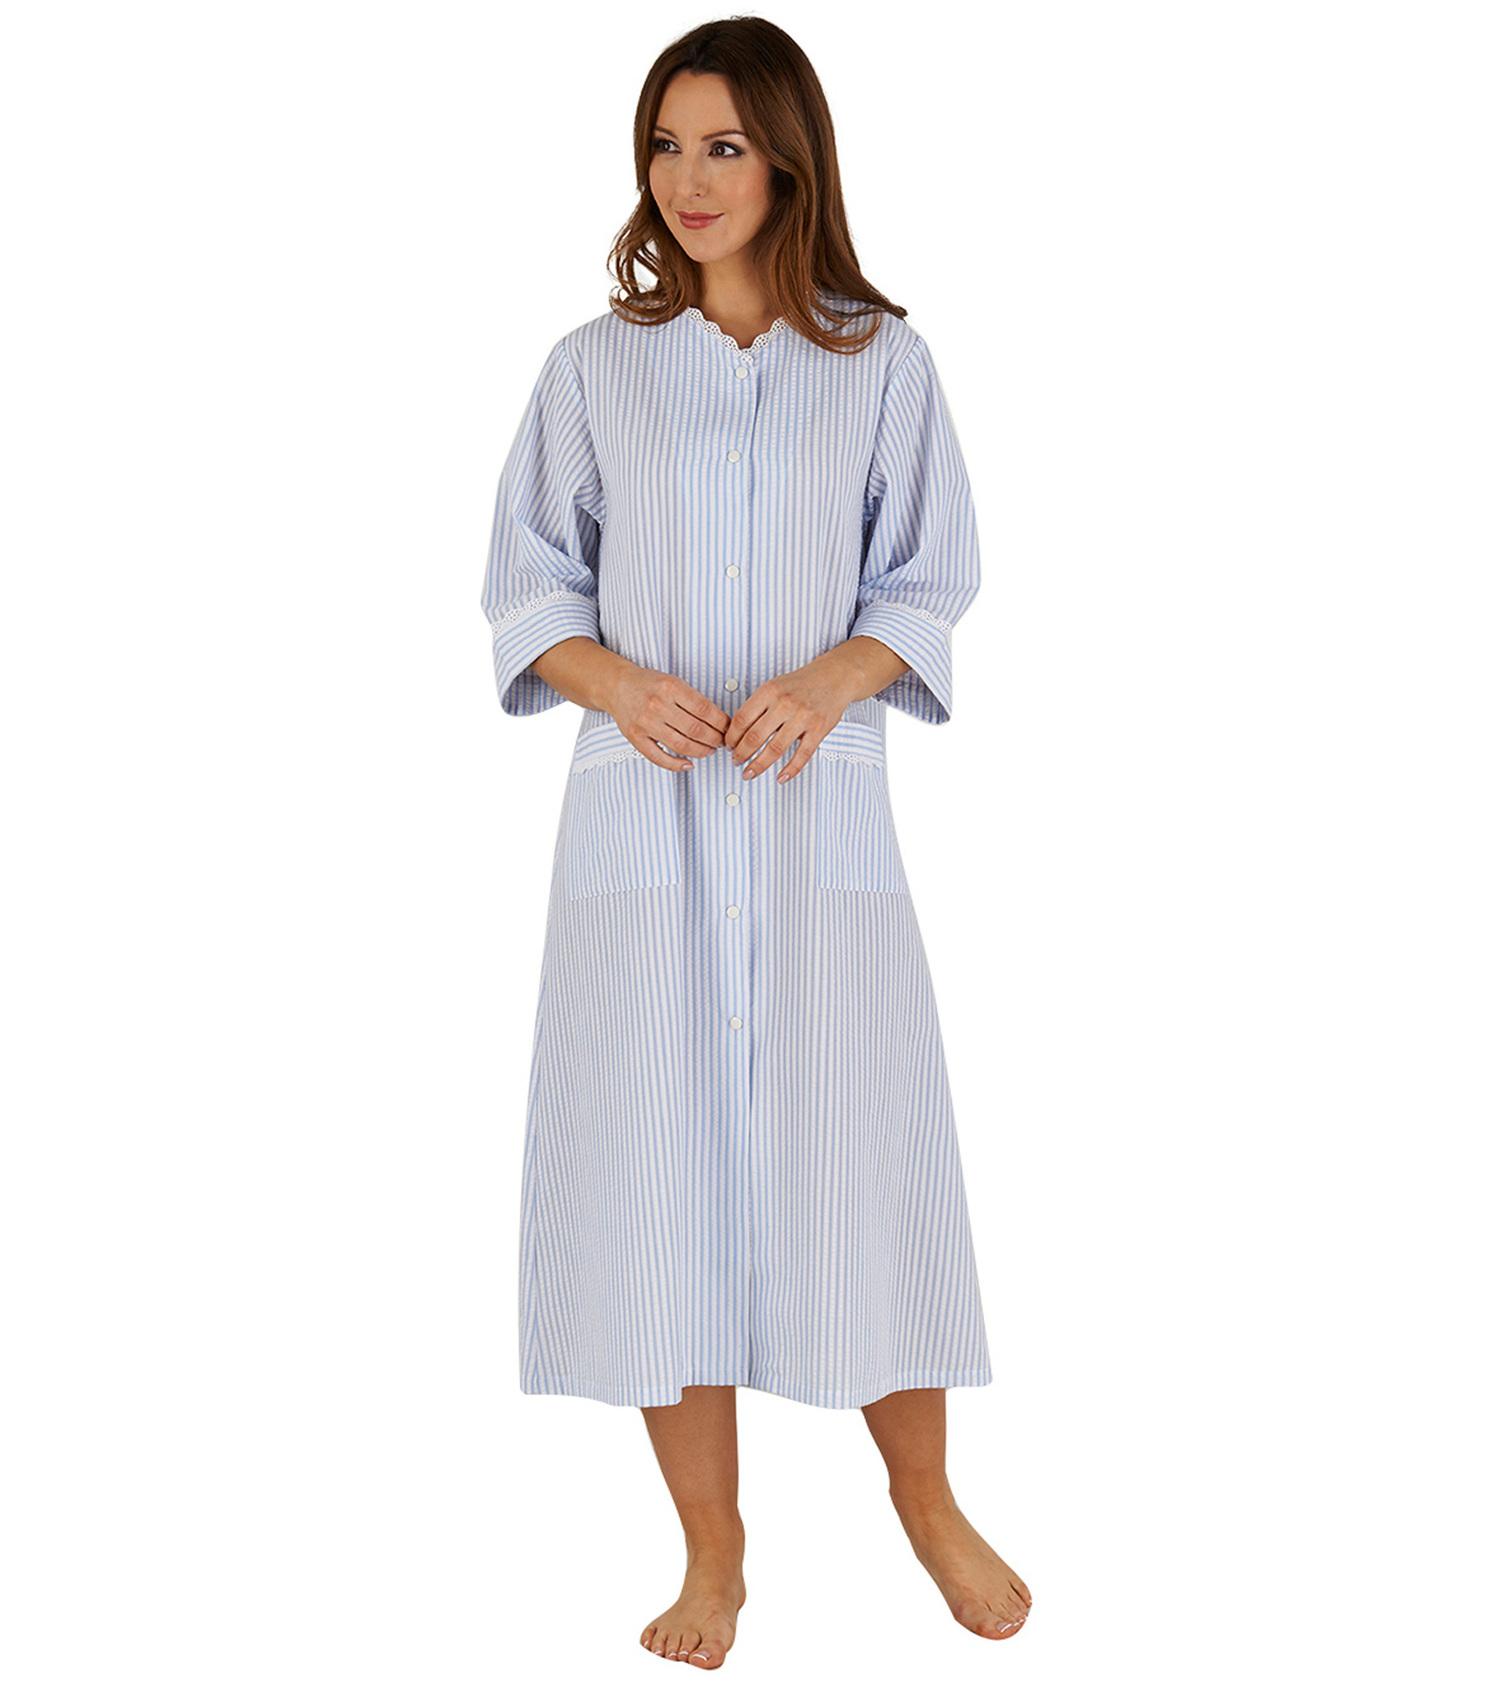 Ladies Dressing Gown Seersucker Stripe Easy Fastening Poppers Lace